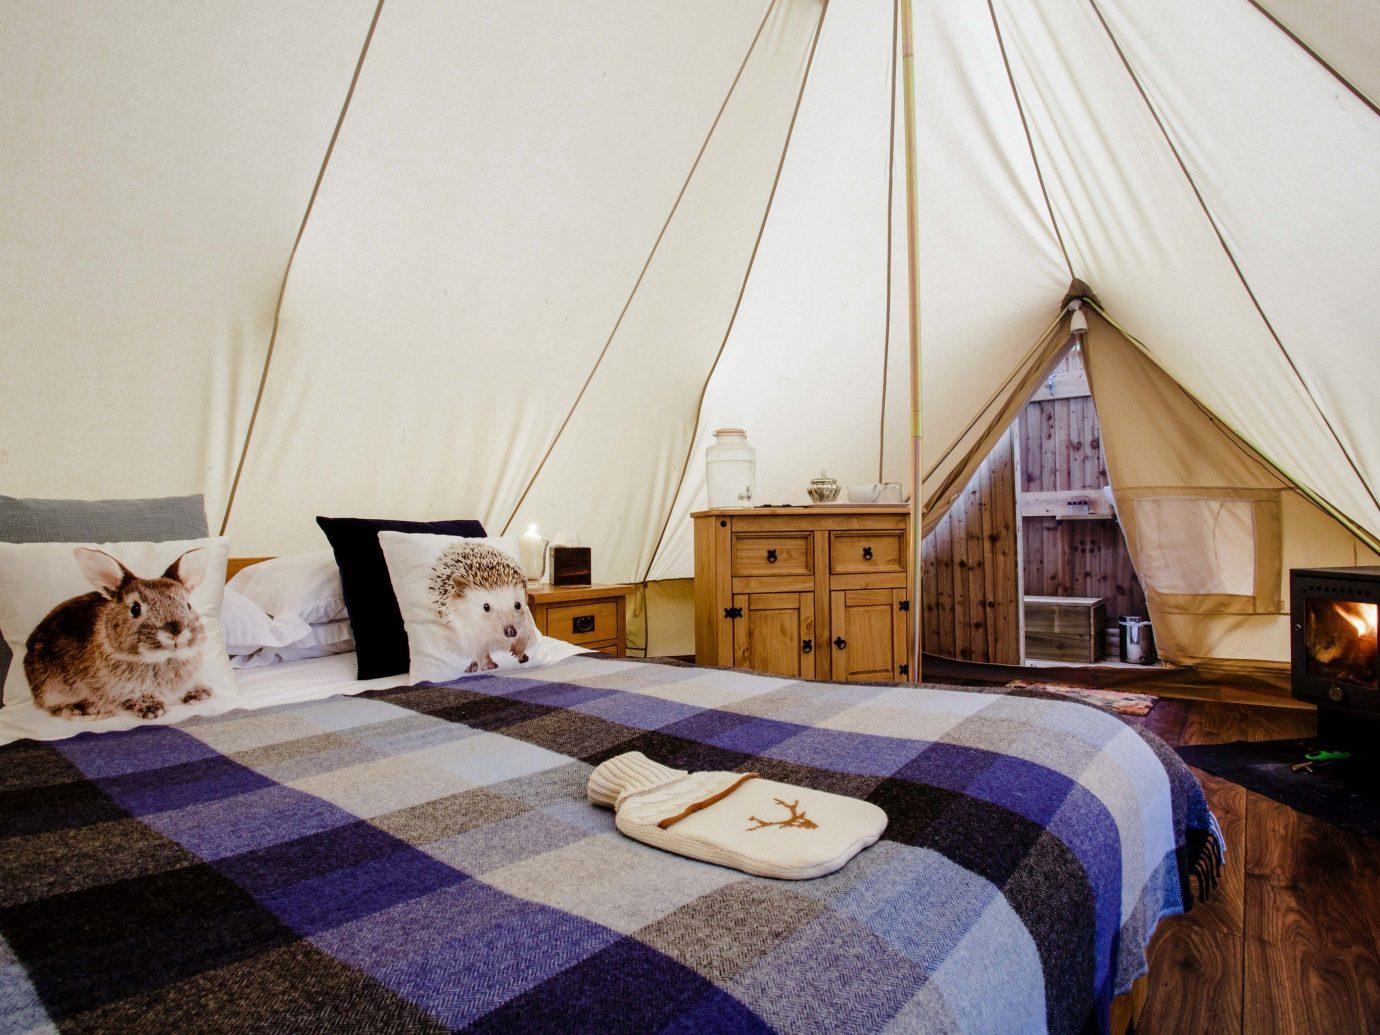 Glamping Outdoors + Adventure Trip Ideas room Bedroom bed interior design furniture Suite home estate floor ceiling flooring